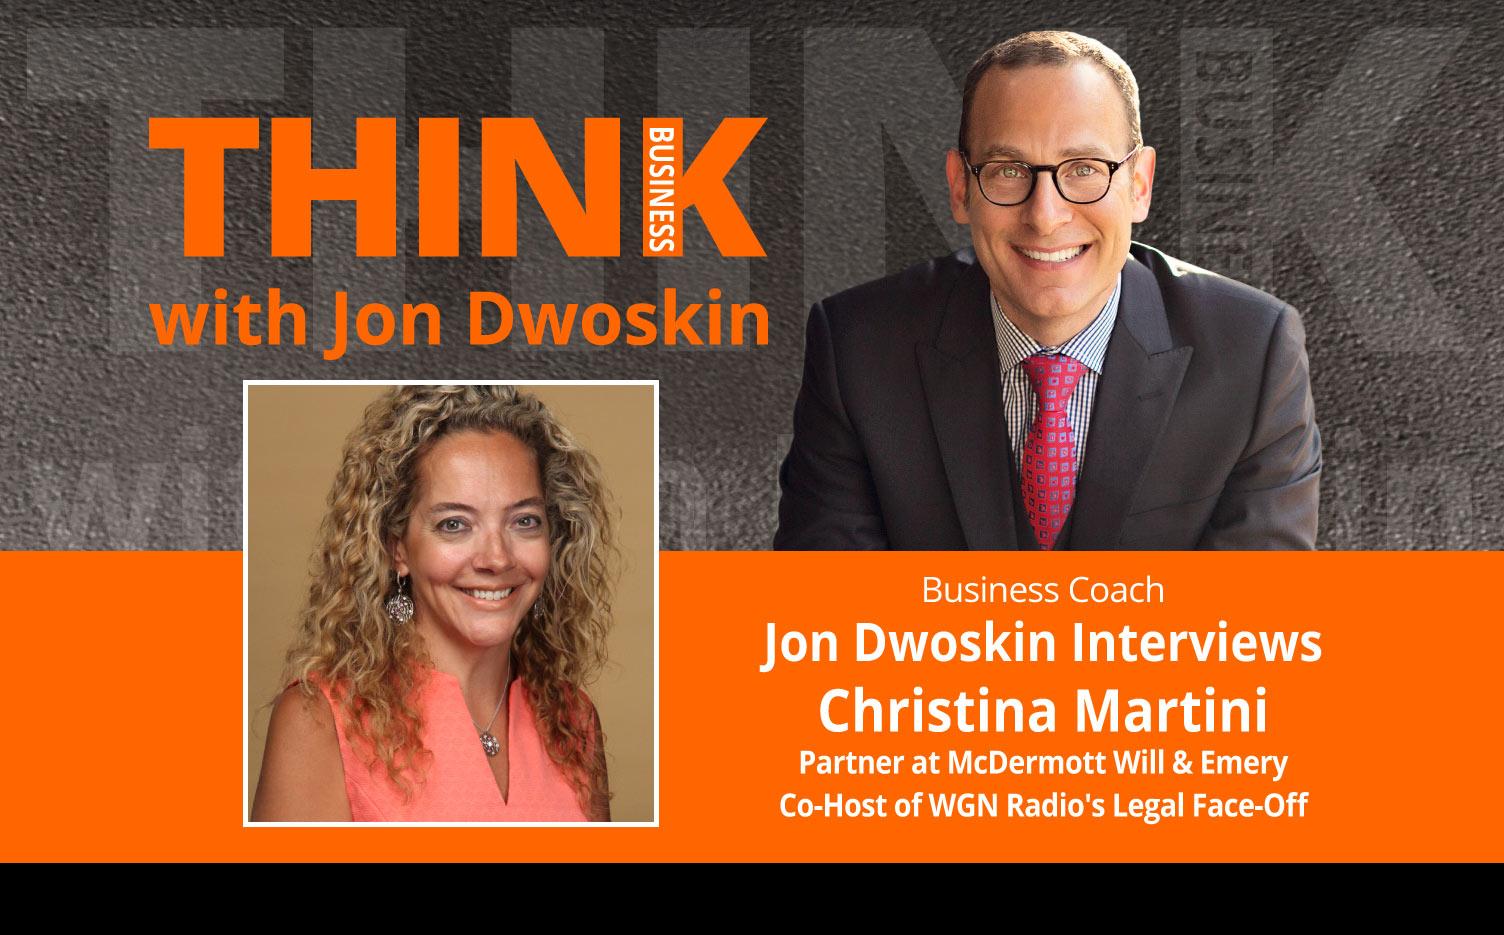 THINK Business Podcast: Jon Dwoskin Interviews Christina Martini, Partner at McDermott Will & Emery, Co-Host of WGN Radio's Legal Face-Off